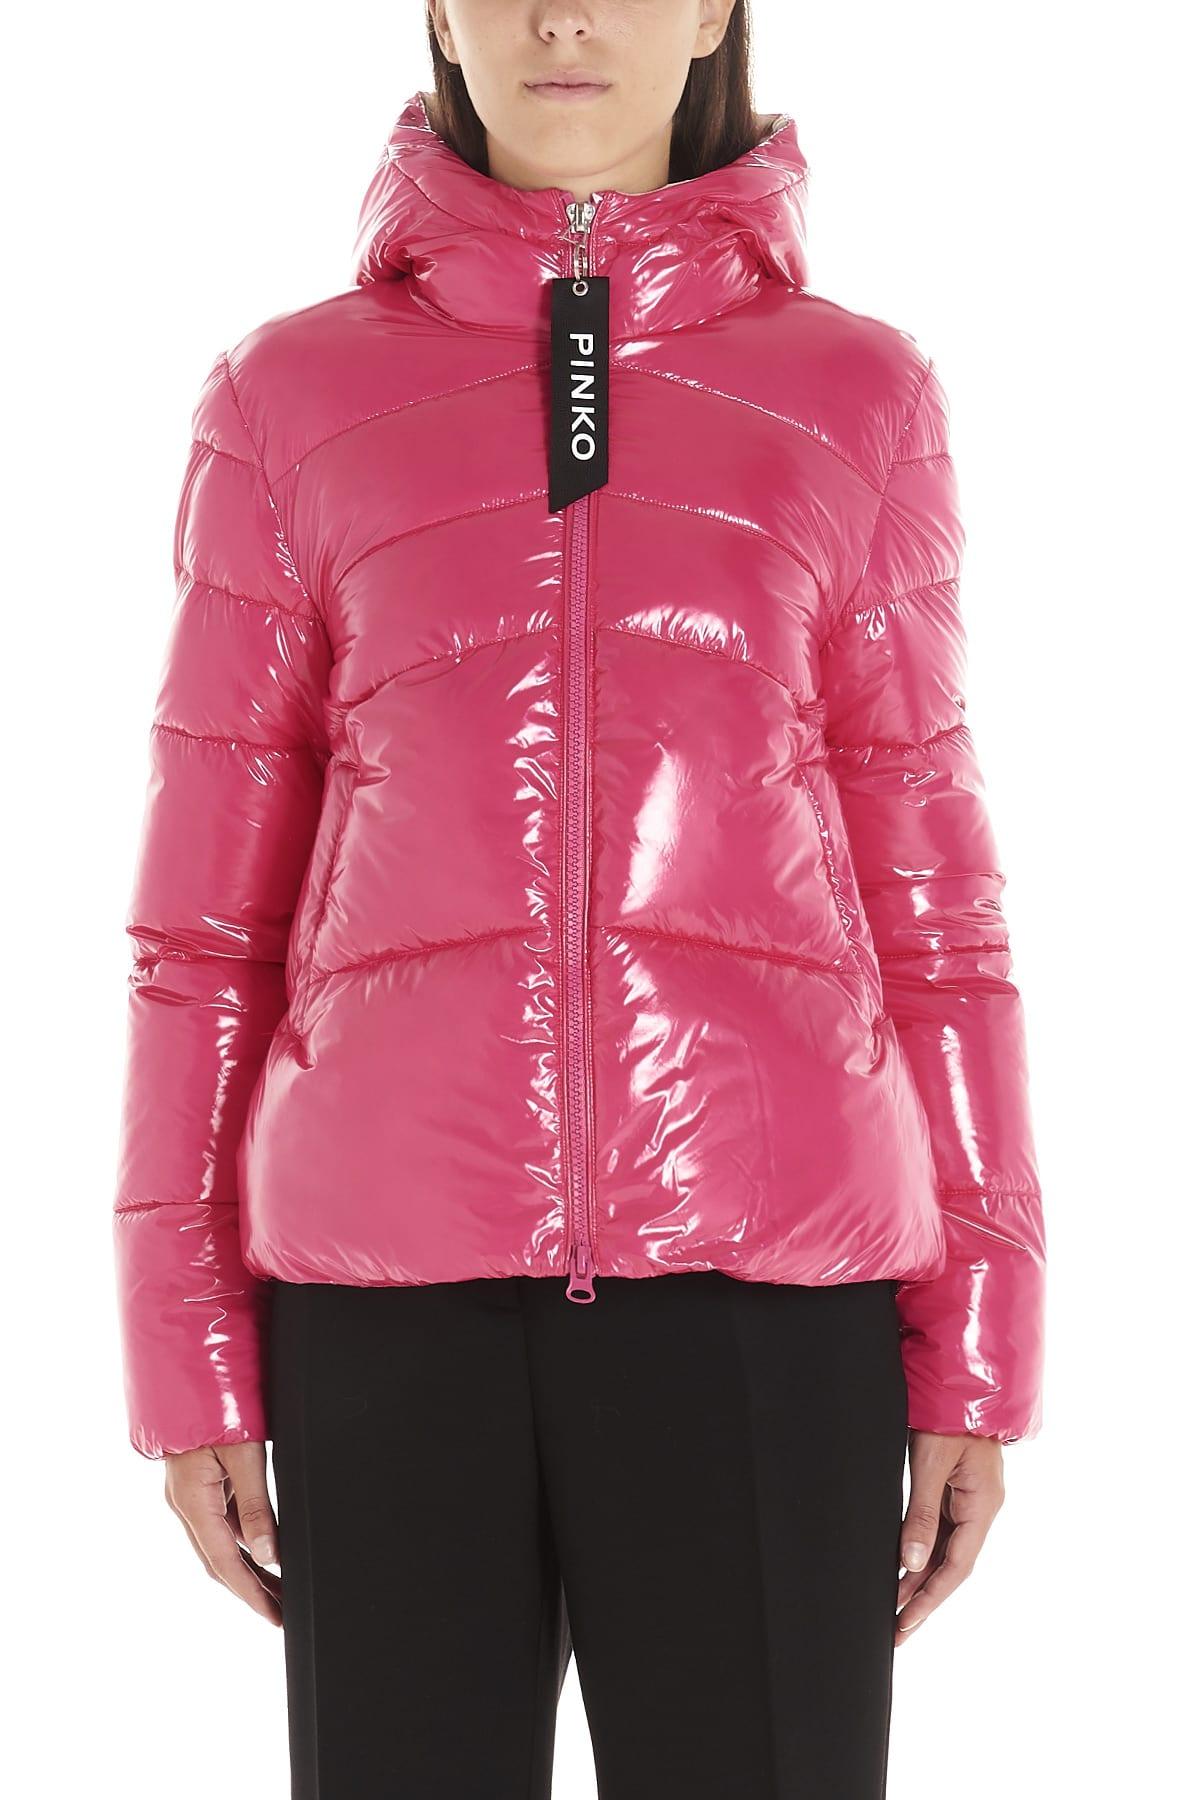 Pinko tradurre Jacket